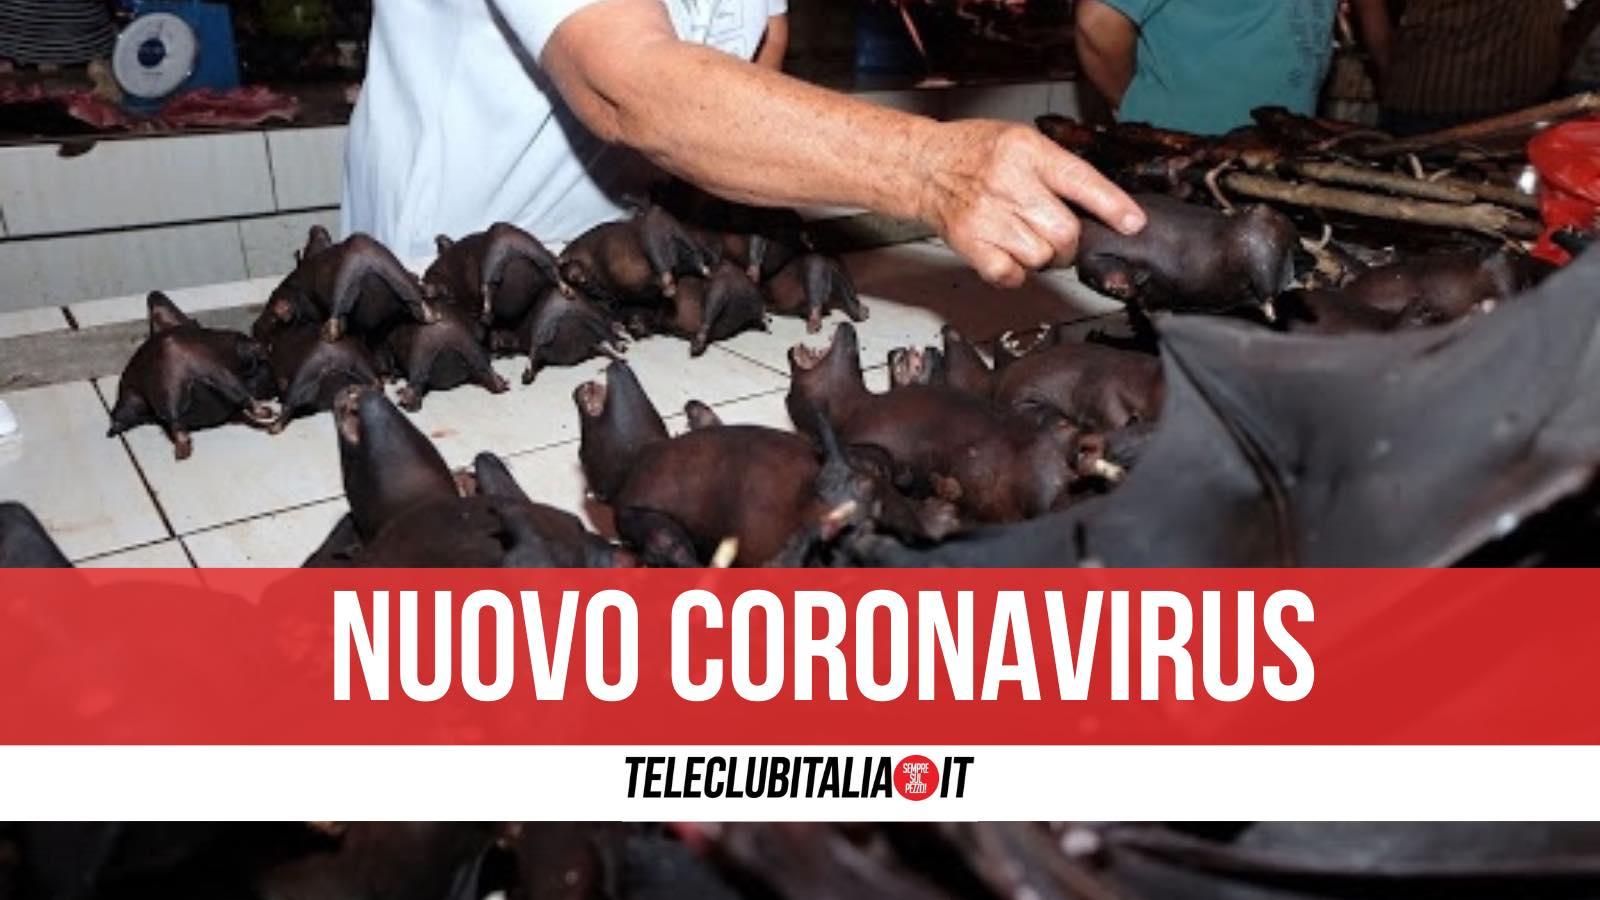 pipistrelli nuovo coronavirus thailandia